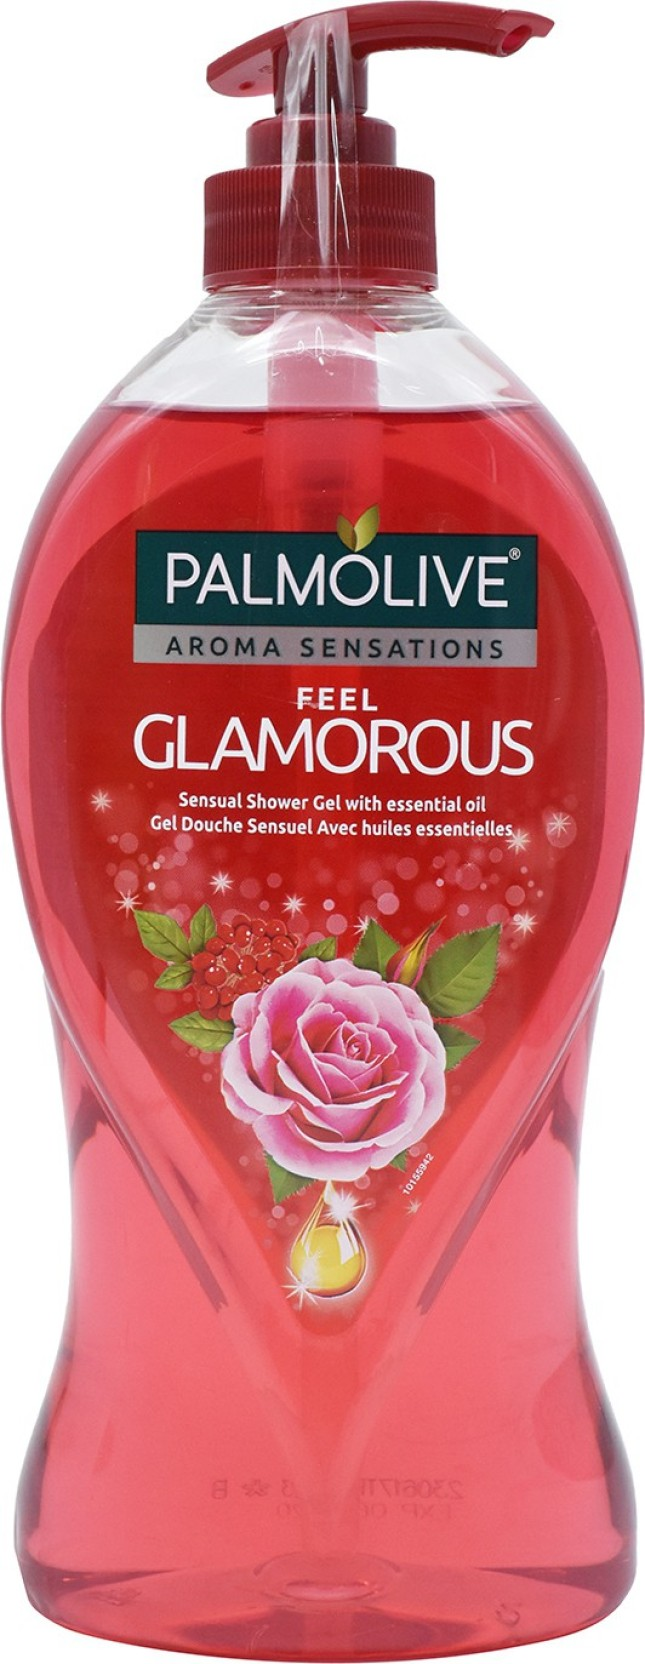 Palmolive Shower Gel Sensual 750ml Cek Harga Terkini Dan Black Orchid Milk 1l Twinpacks Free Towel Aroma Sensations Feel Glamorous 750 Ml